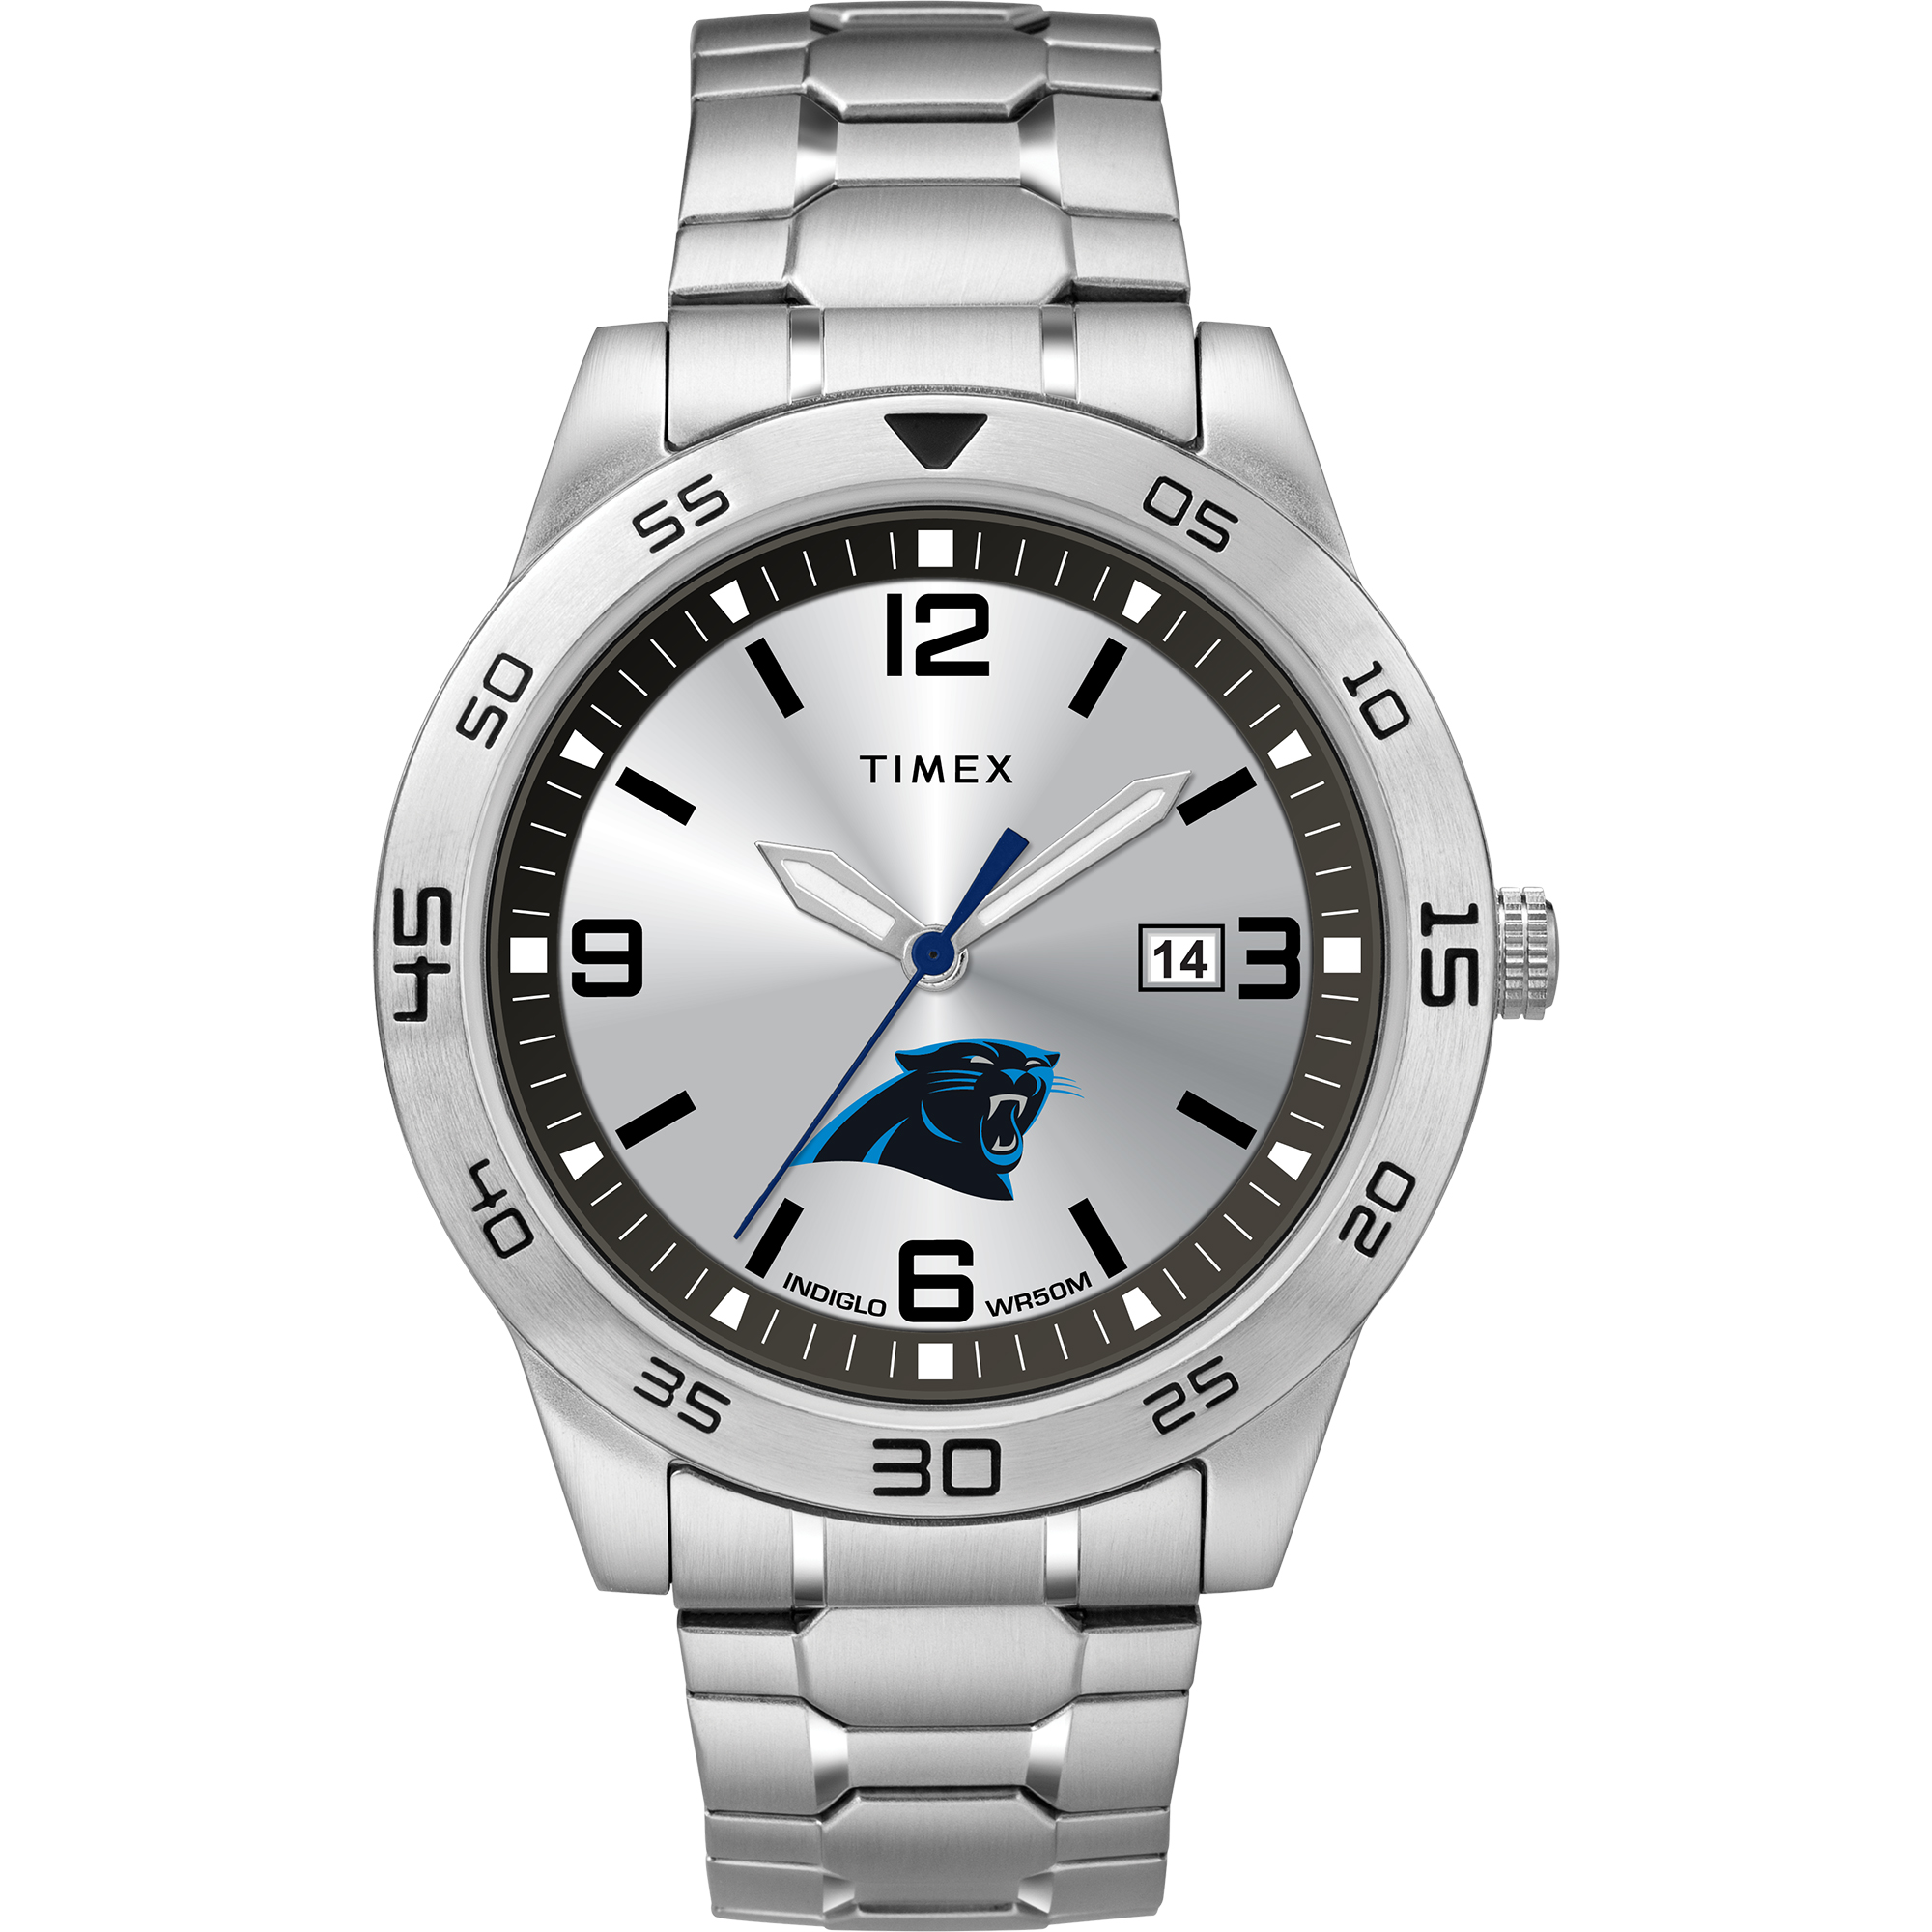 Timex - NFL Tribute Collection Citation Men's Watch, Carolina Panthers